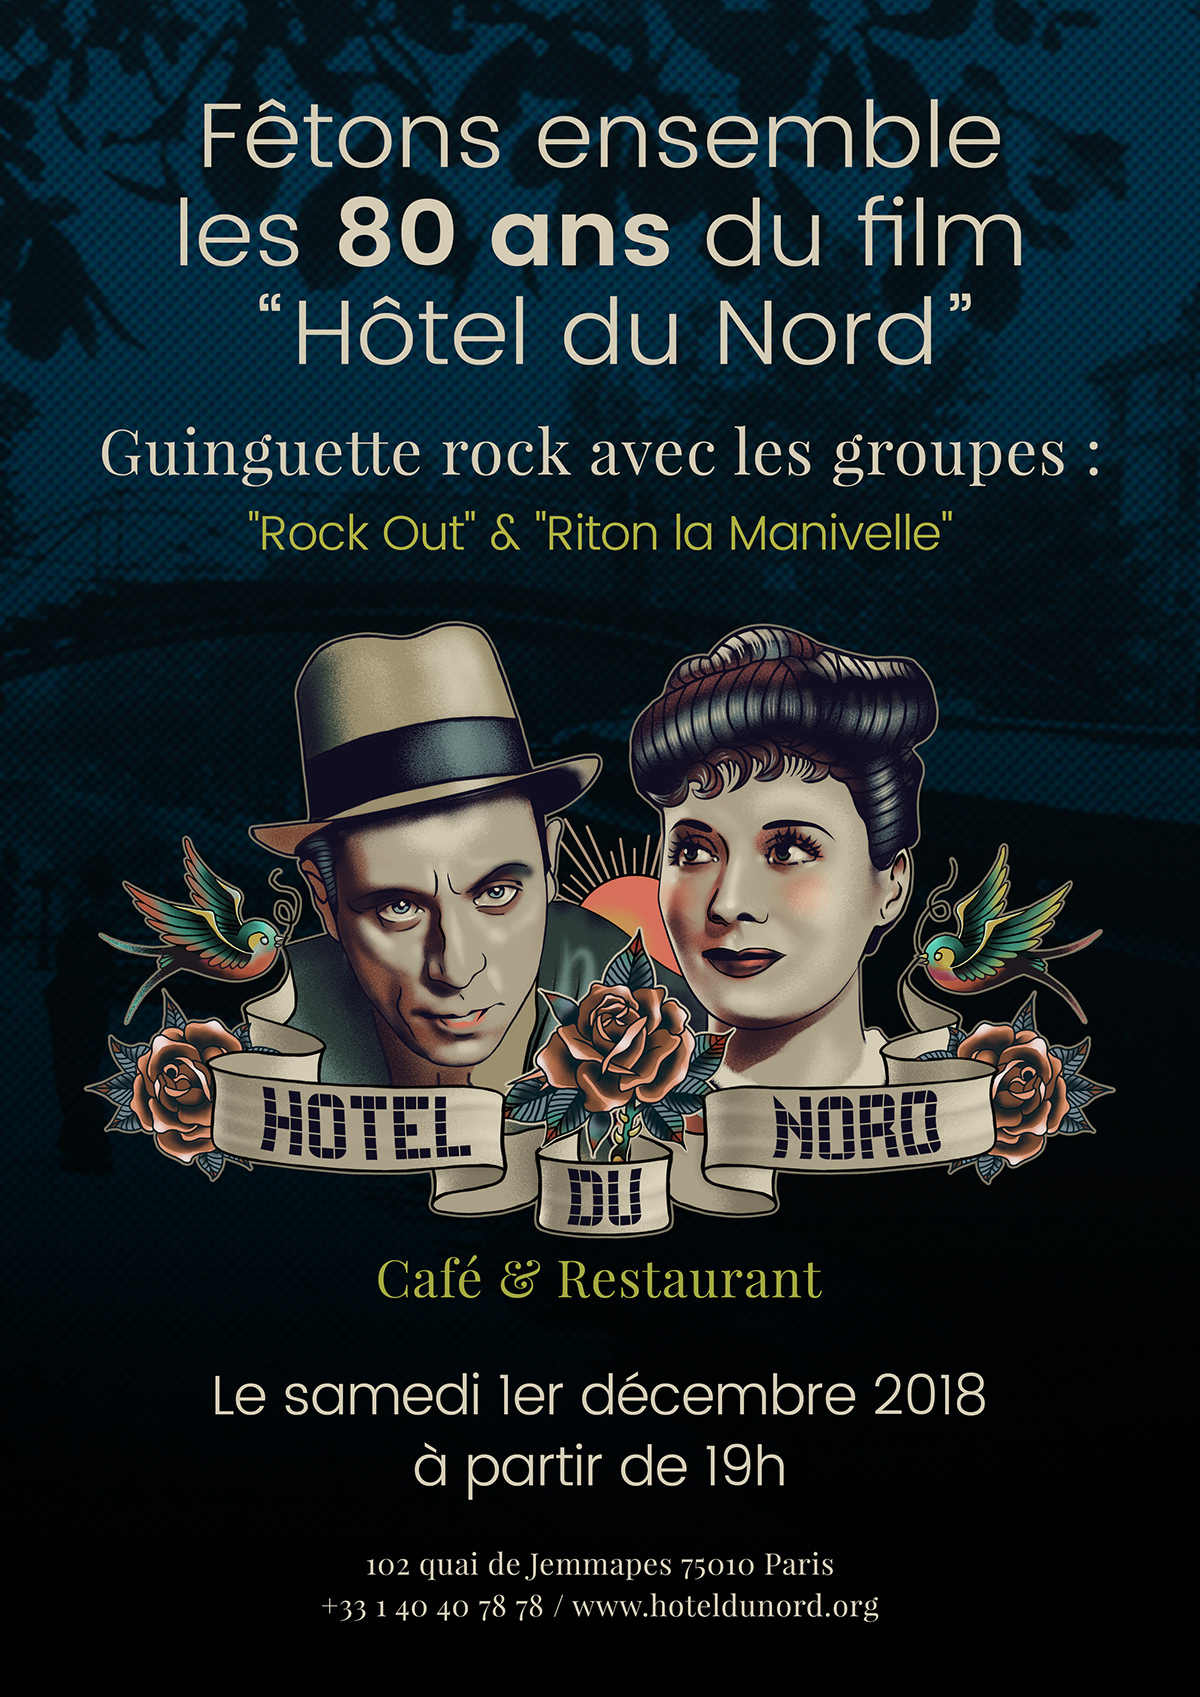 affiche Cinema france ILLUSTRATION  Paris restaurant sticker totebag vitrine